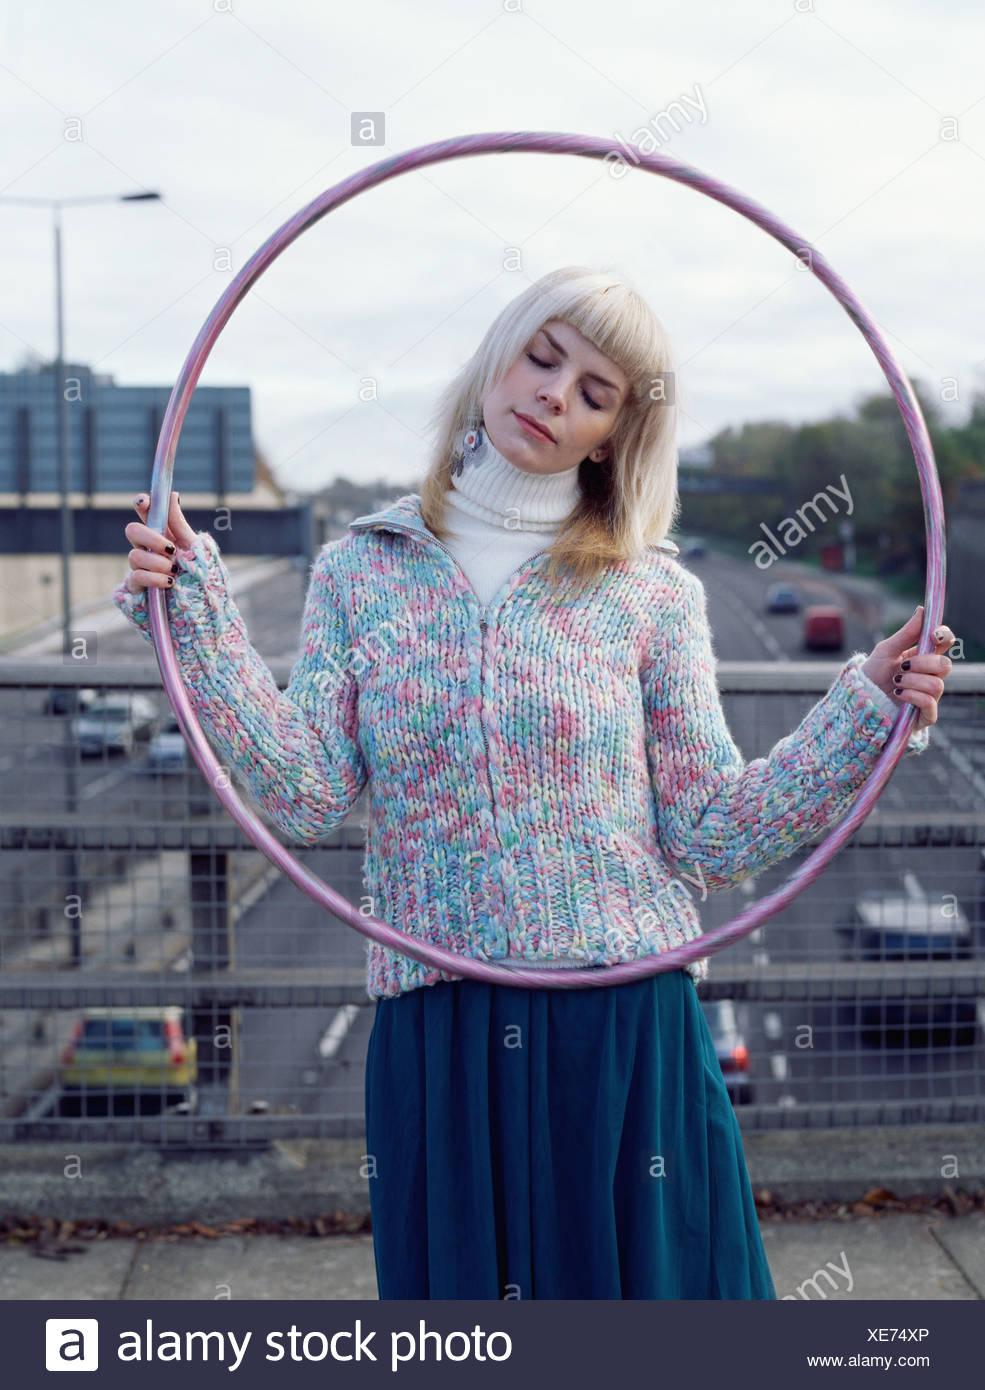 Woman holding hula hoop on motorway bridge - Stock Image